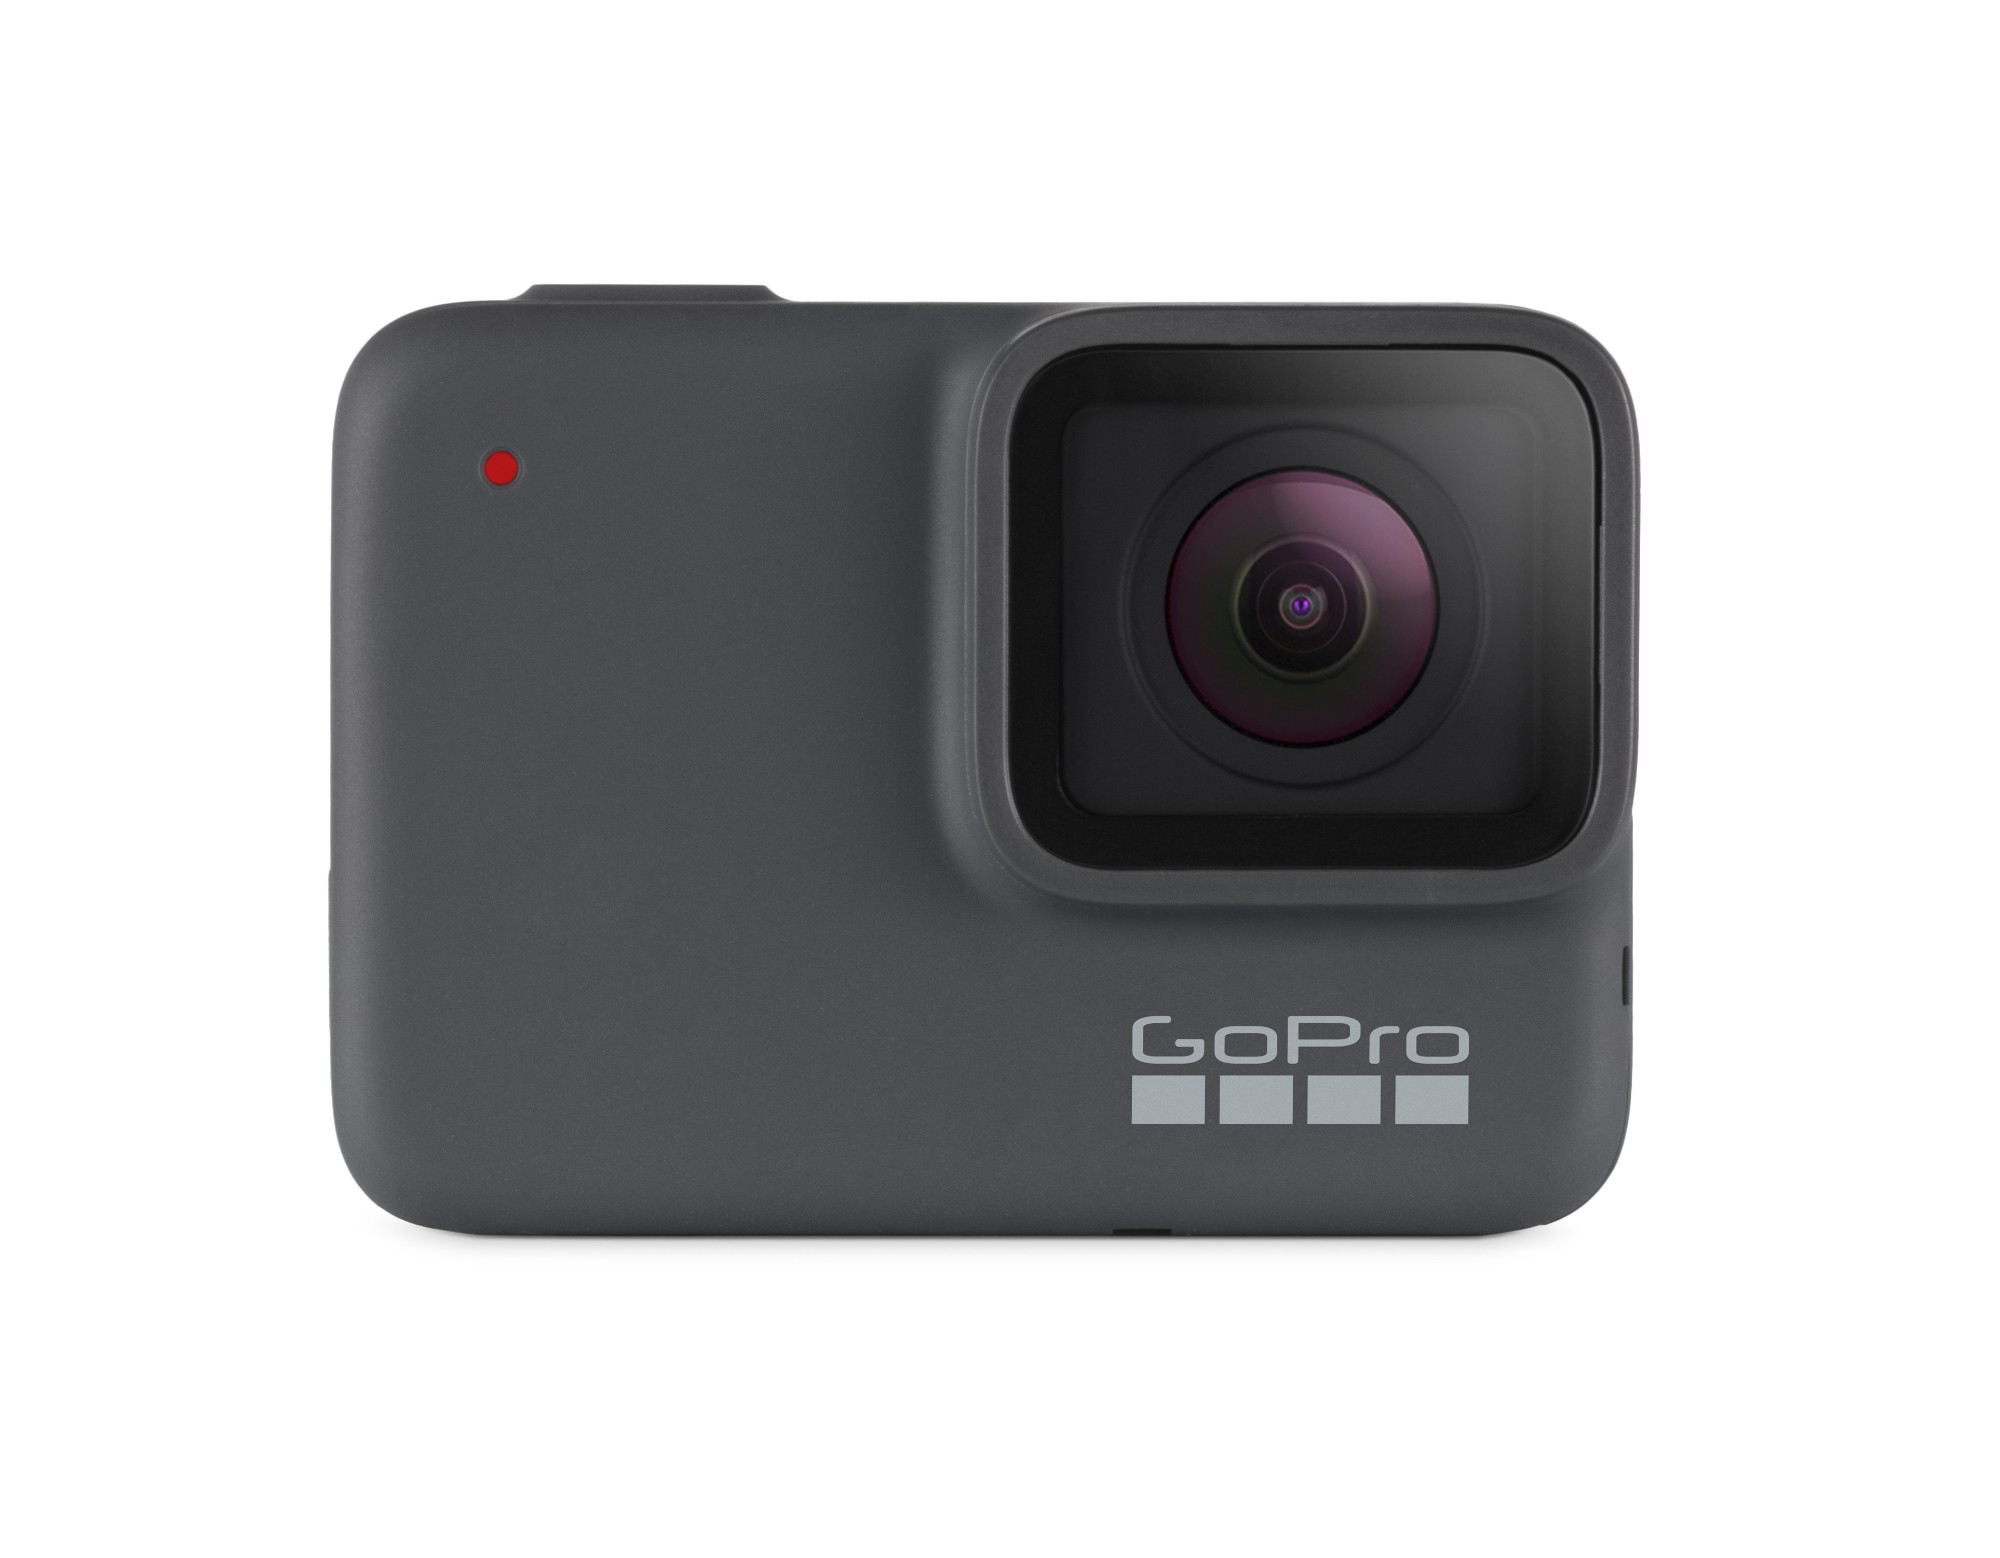 GoPro HERO7 Silver action sports camera 4K Ultra HD 10 MP Wi-Fi